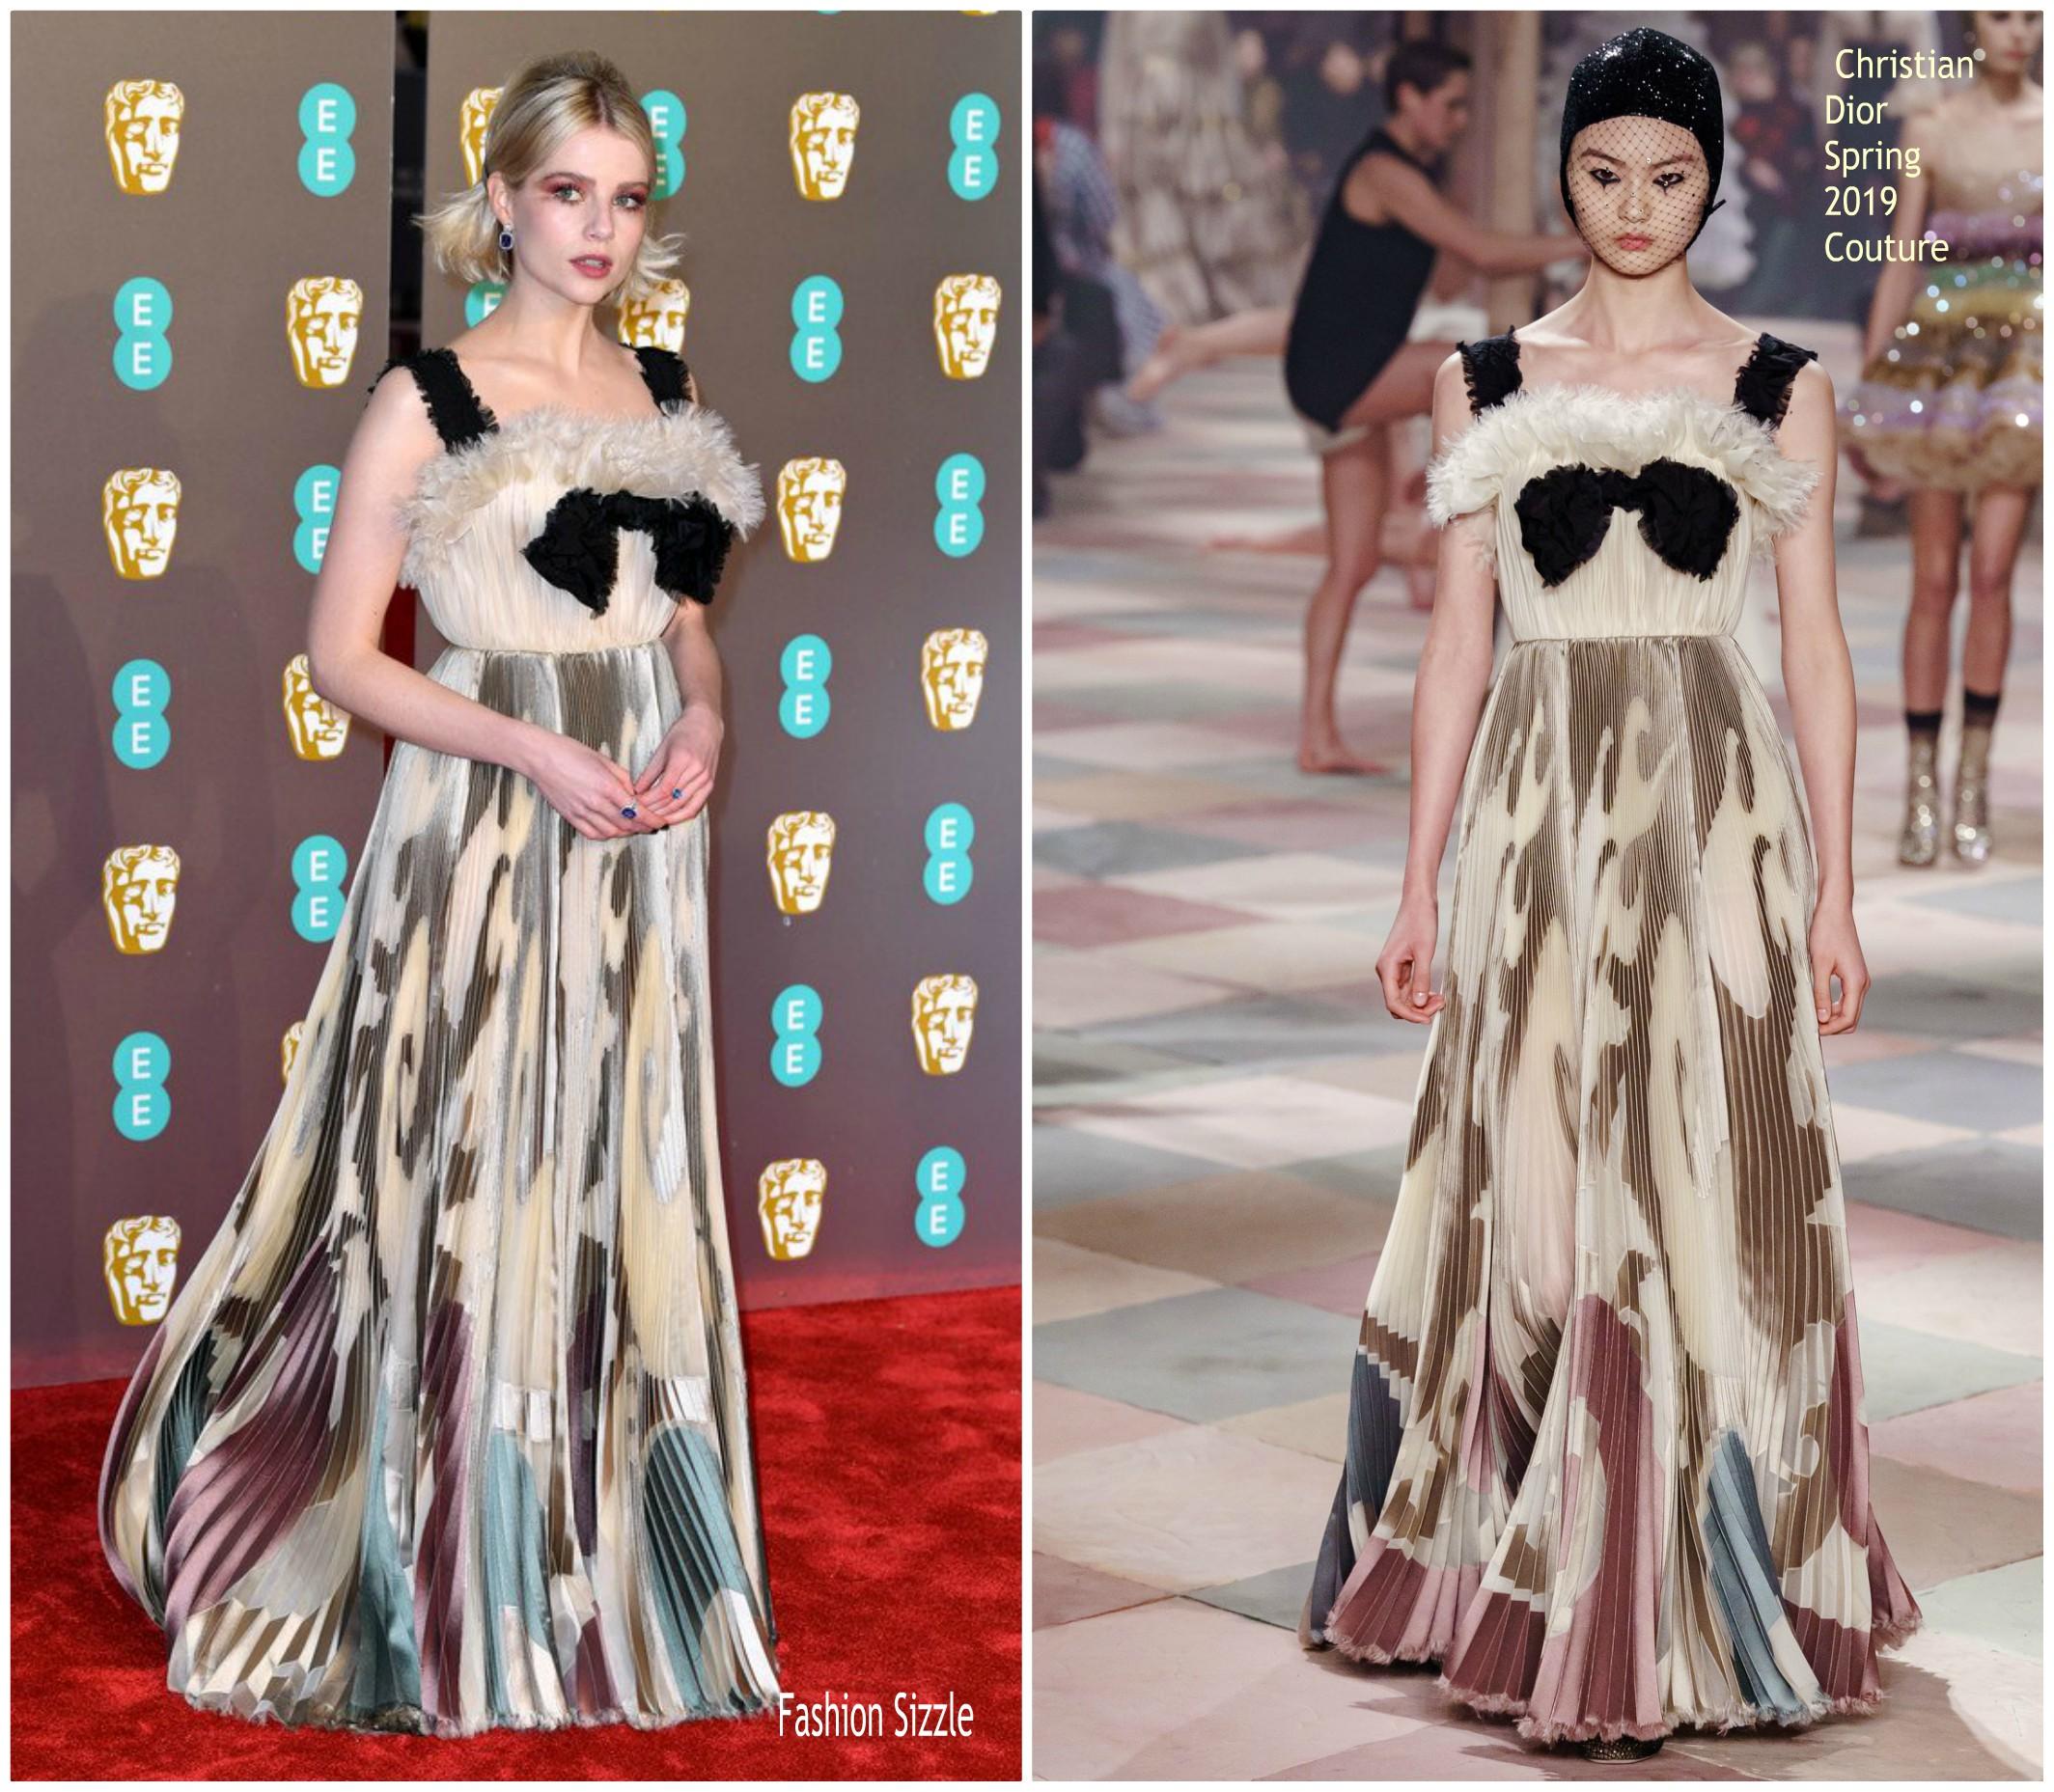 lucy-boynton-in-christian-dior-haute-couture-2019-baftas